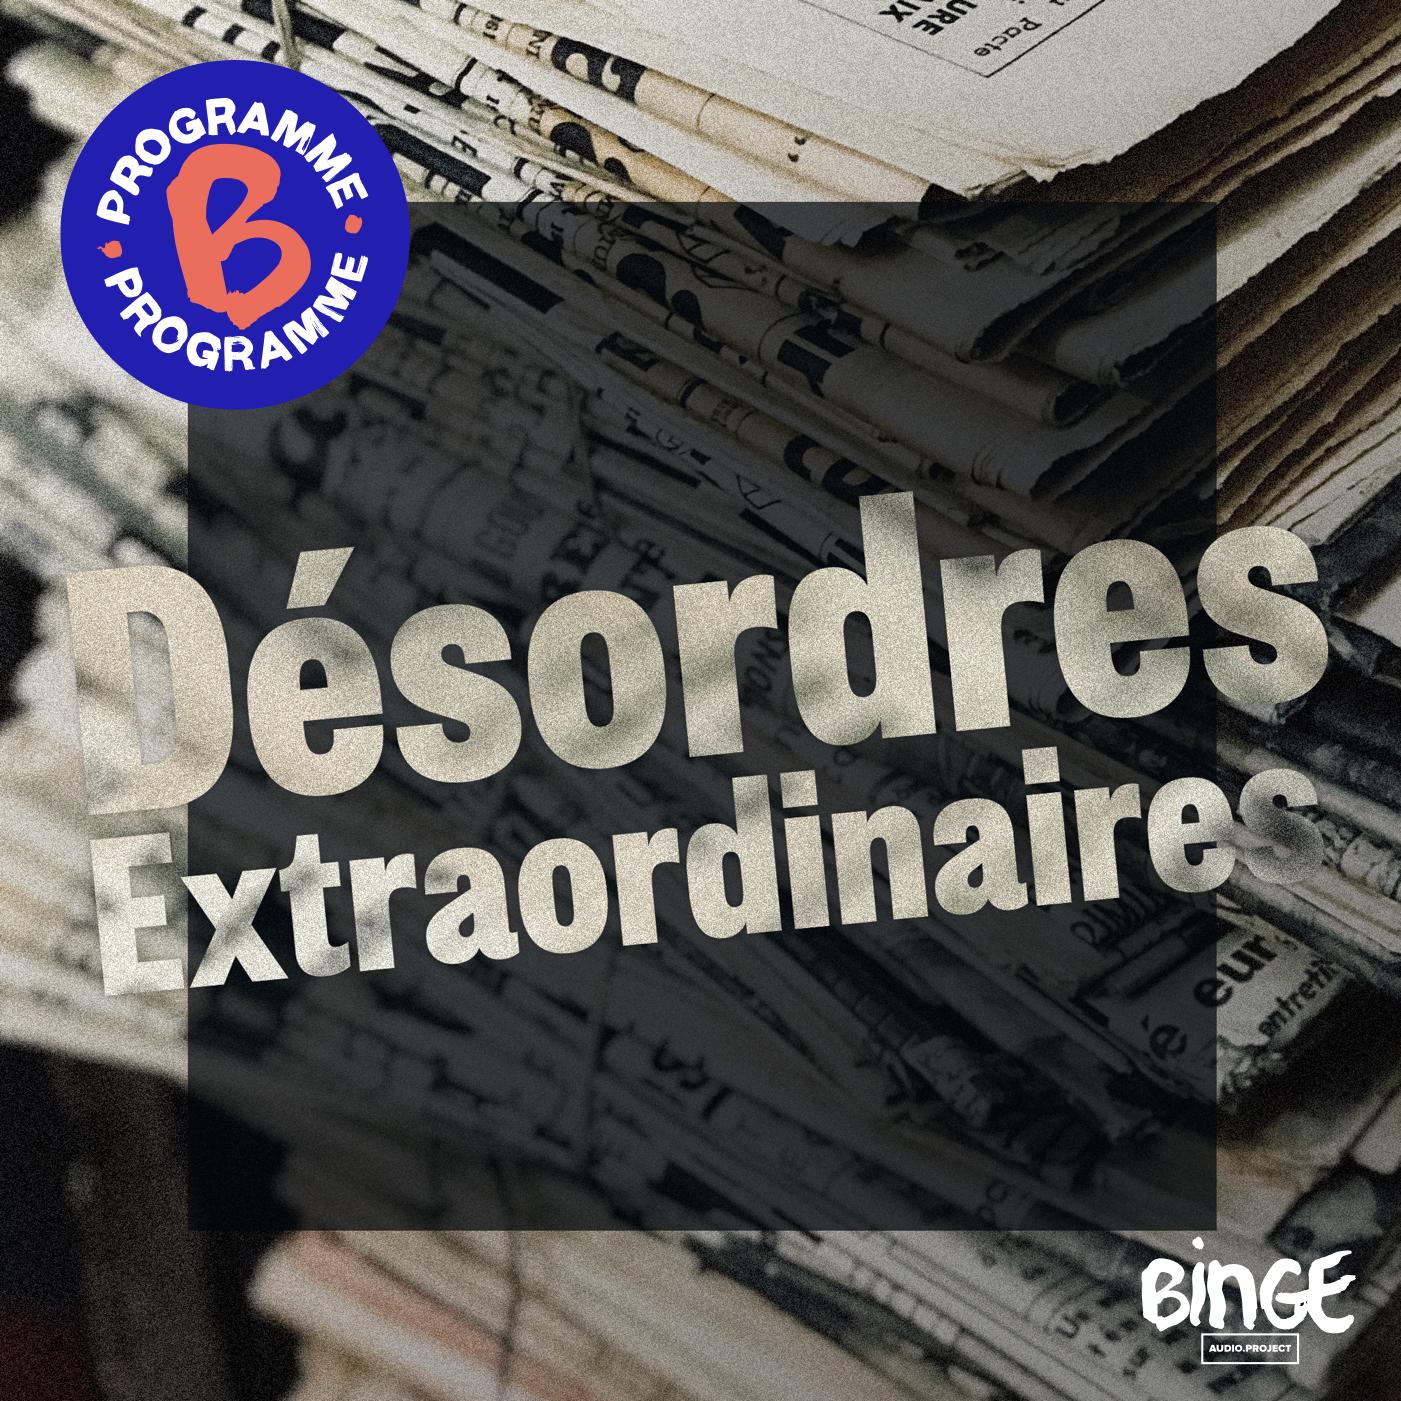 Désordres extraordinaires | Épisode 7